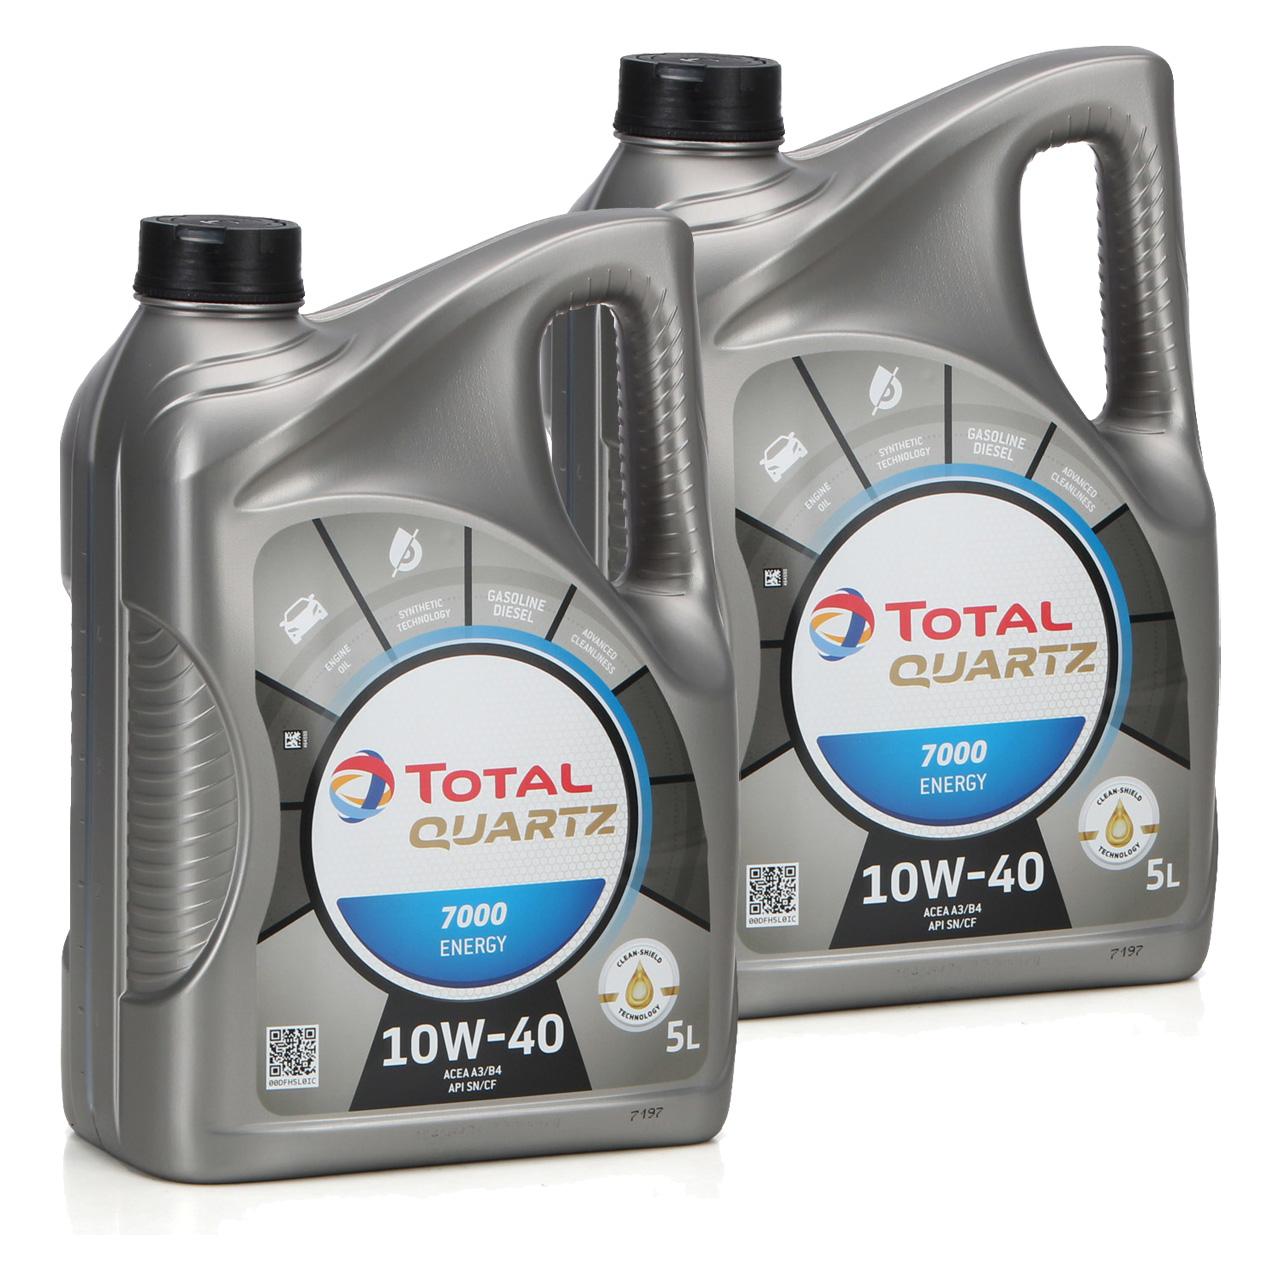 TOTAL QUARTZ 7000 ENERGY Motoröl Öl 10W-40 10W40 VW 501.01/505.00 - 10L 10 Liter